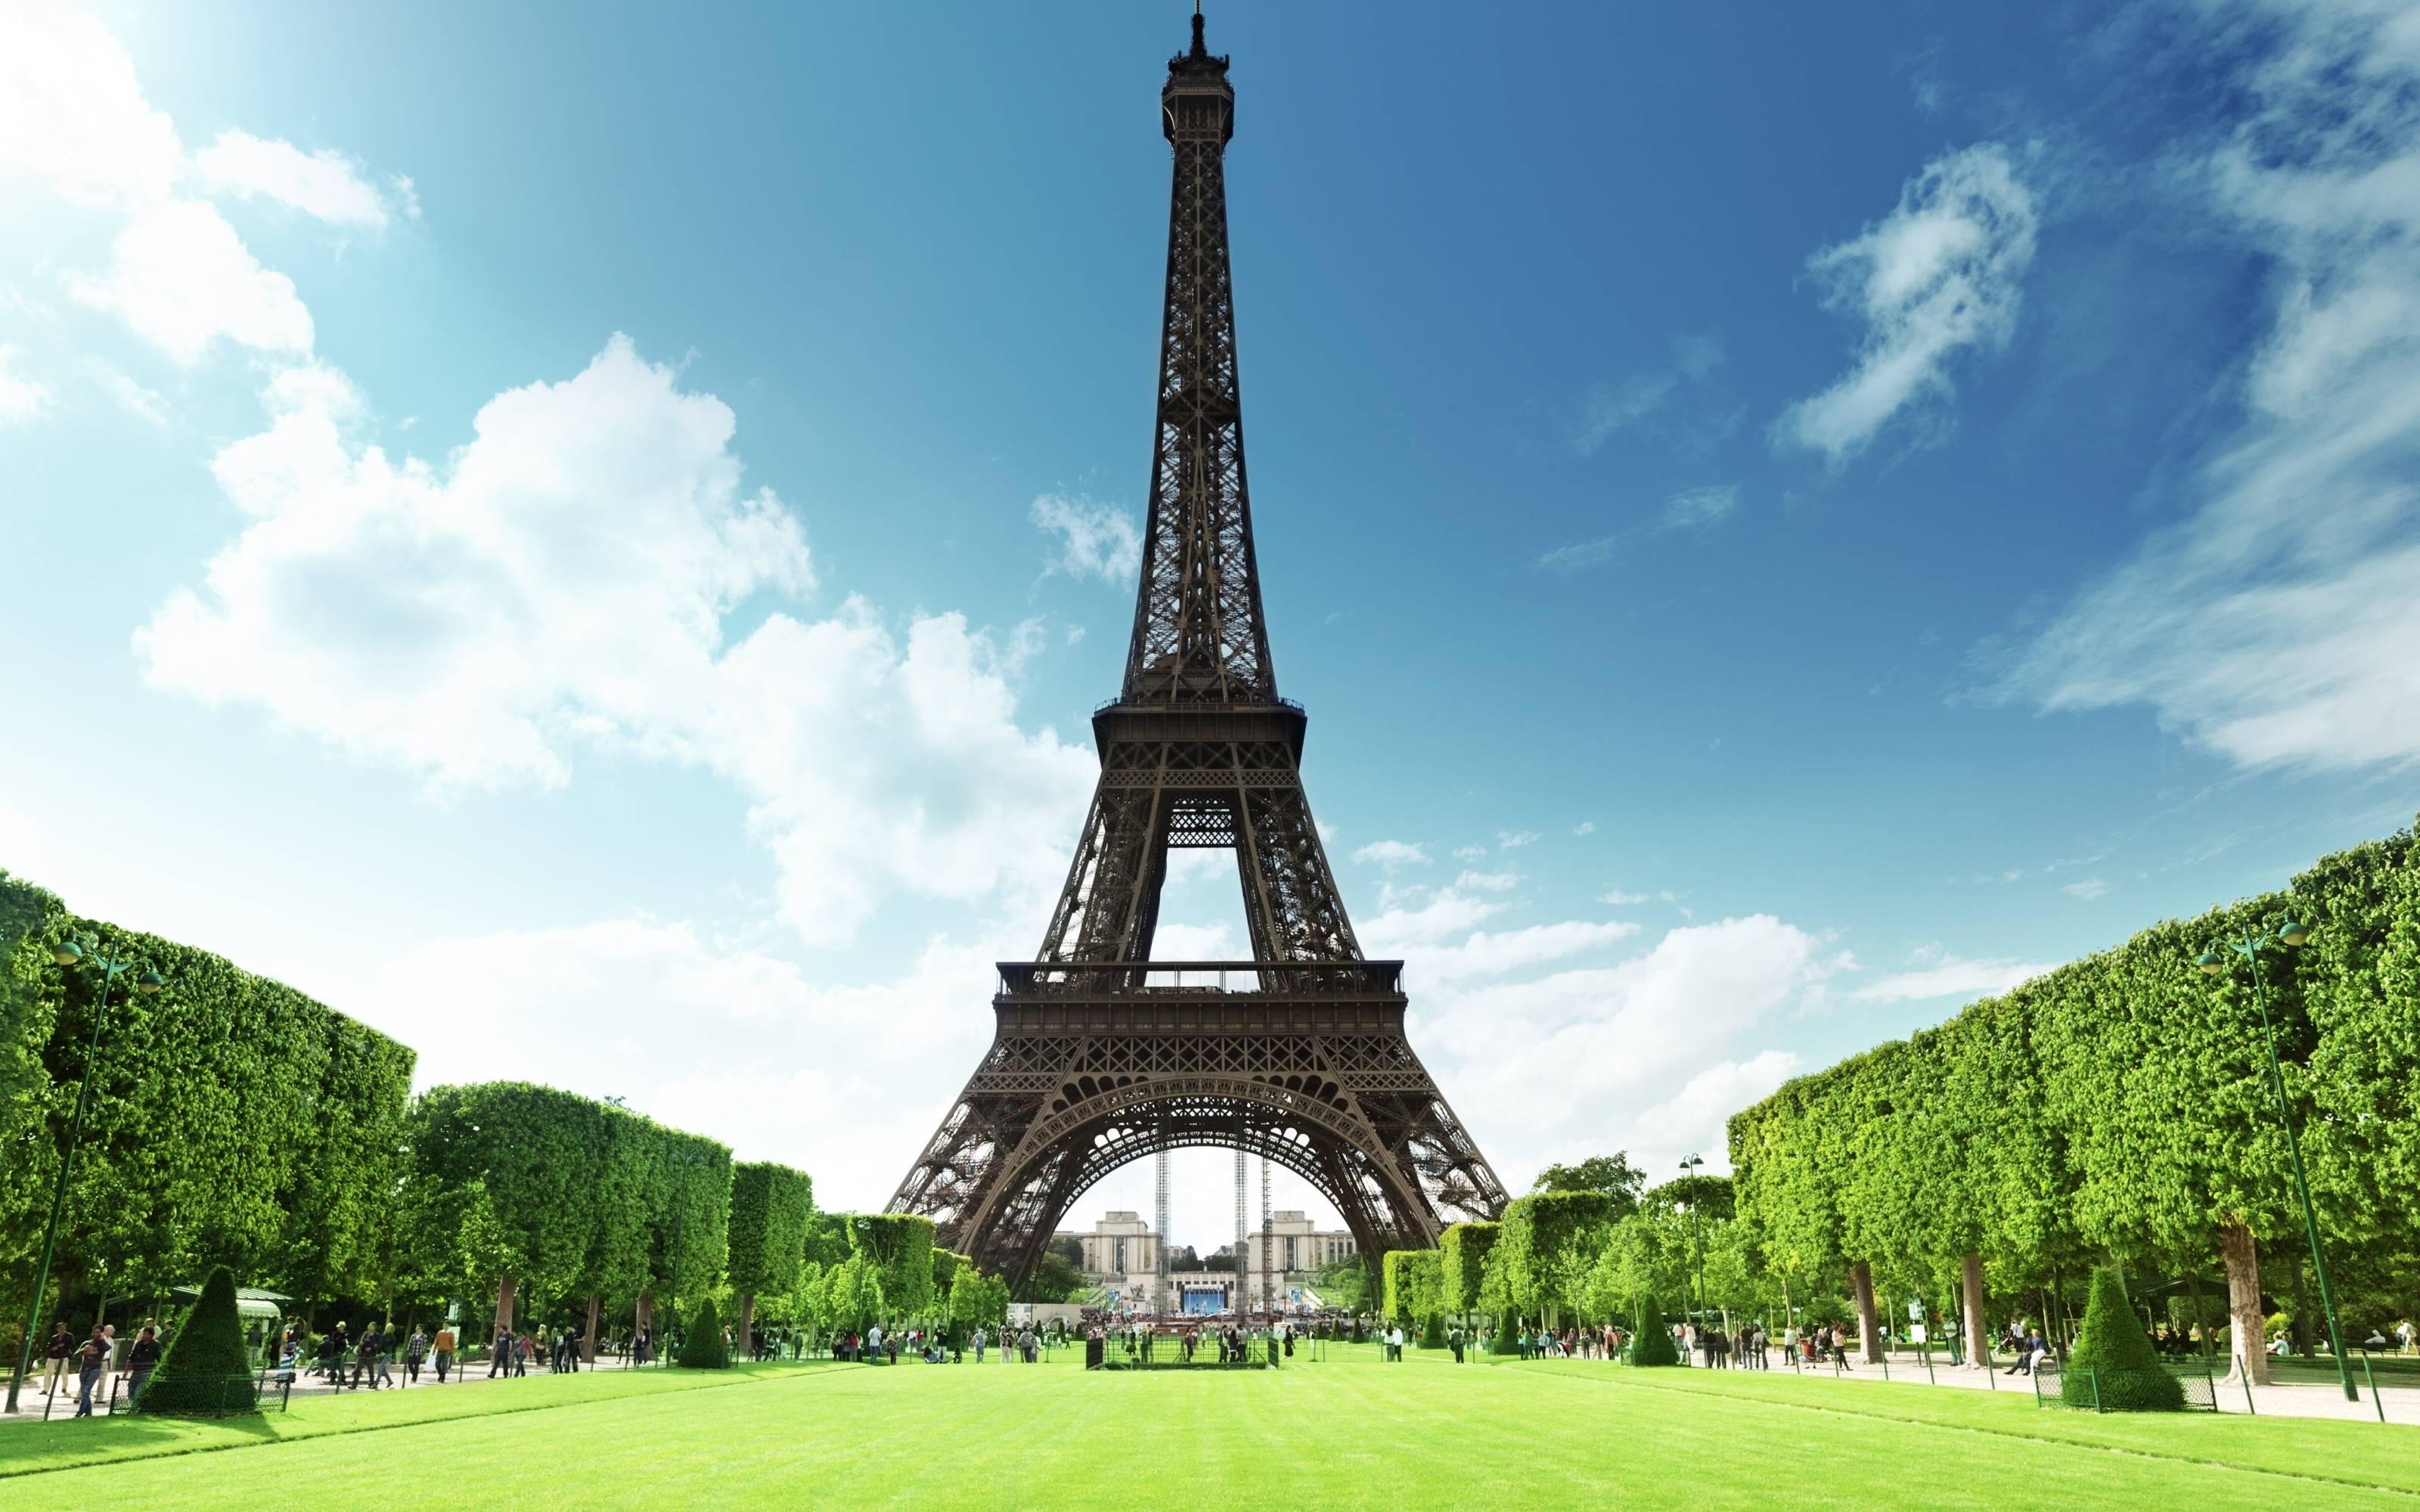 Hd wallpaper eiffel tower - Eiffel Tower 44 395189 High Definition Wallpapers Wallalay Com